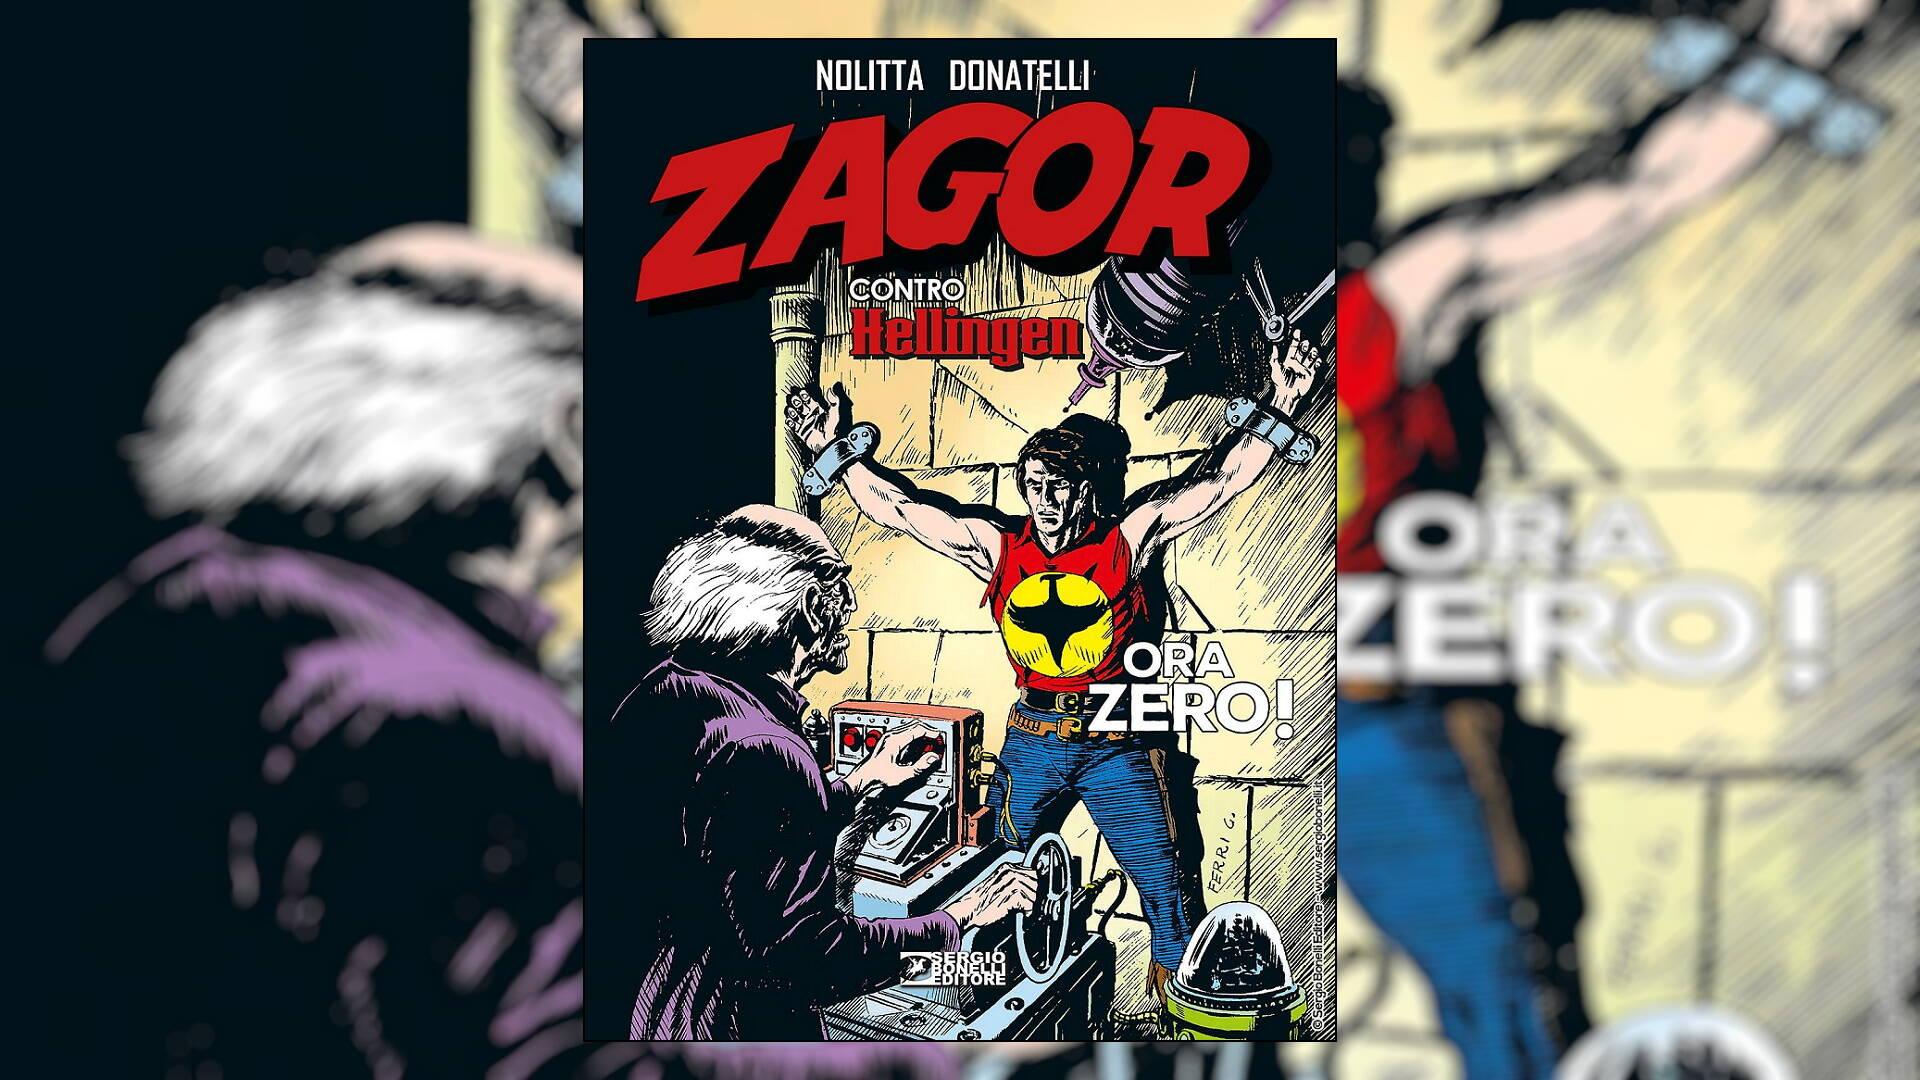 Zagor contro Hellingen - Ora Zero! recensione